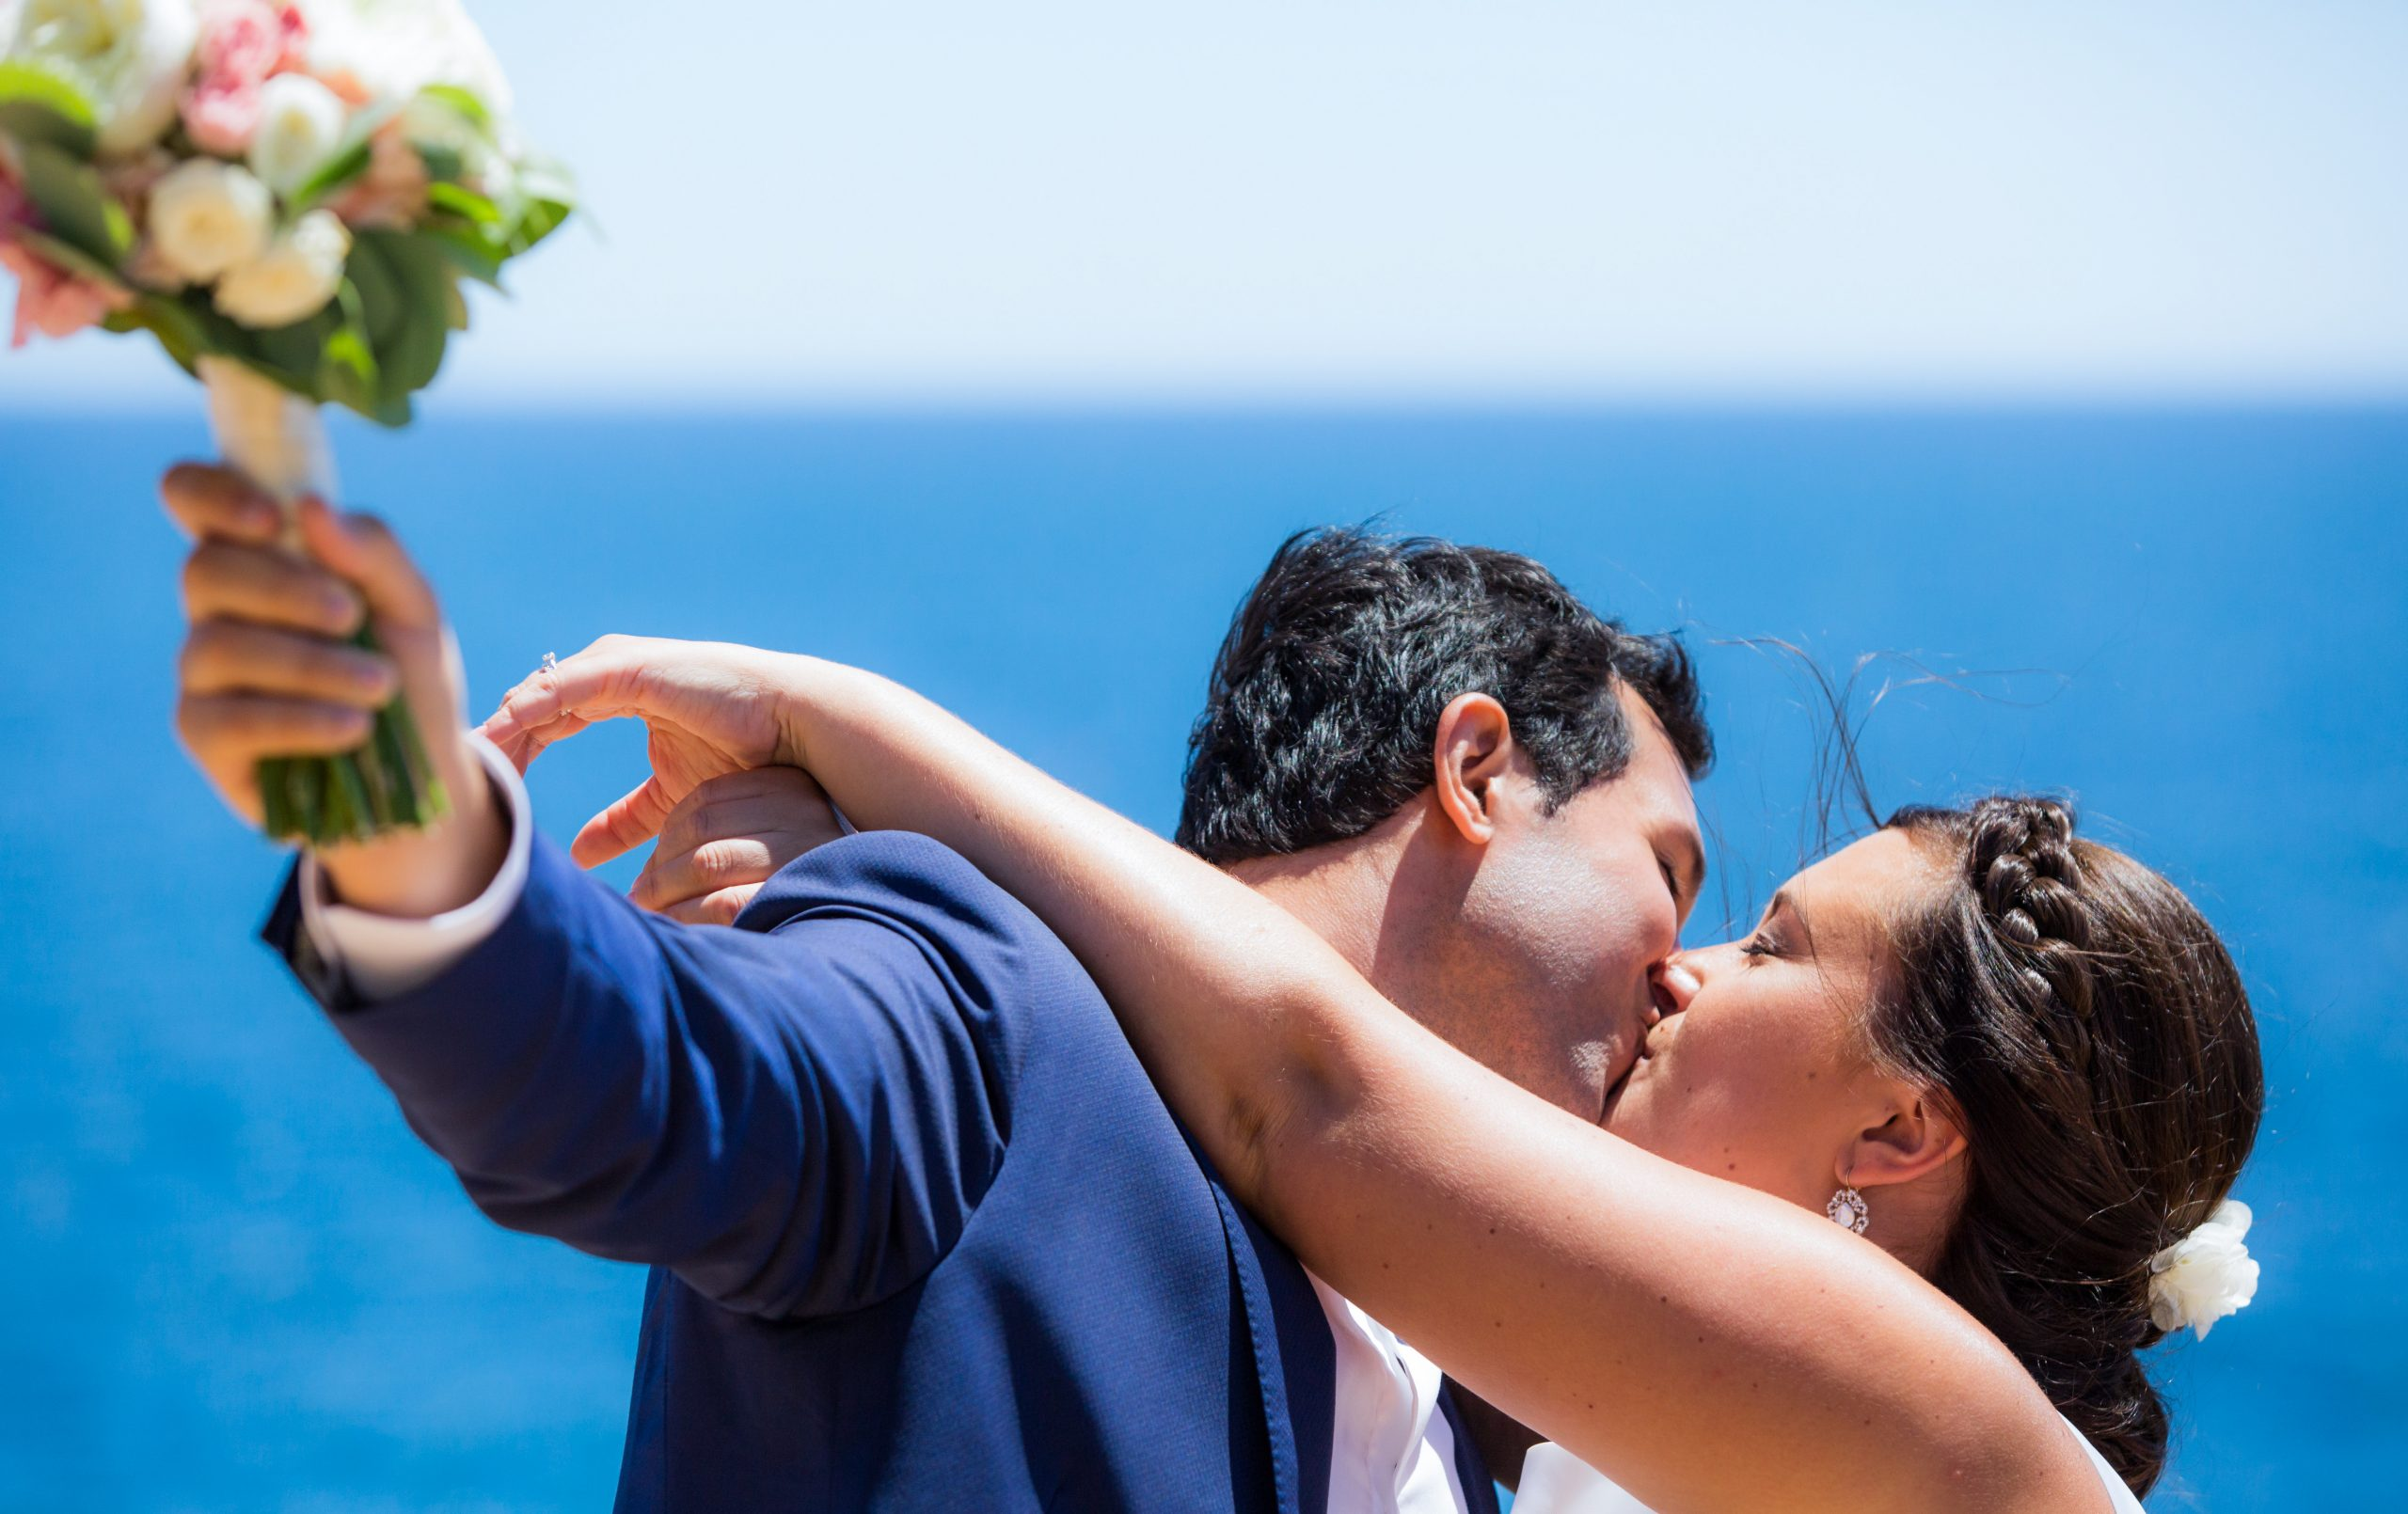 Photographe mariage - Montpellier - Nice - original - Mariage Nice - Réception mariage - Mariage Hôtel Le Meridien - Mariage Côte d'azur - Photographie mariage Nice